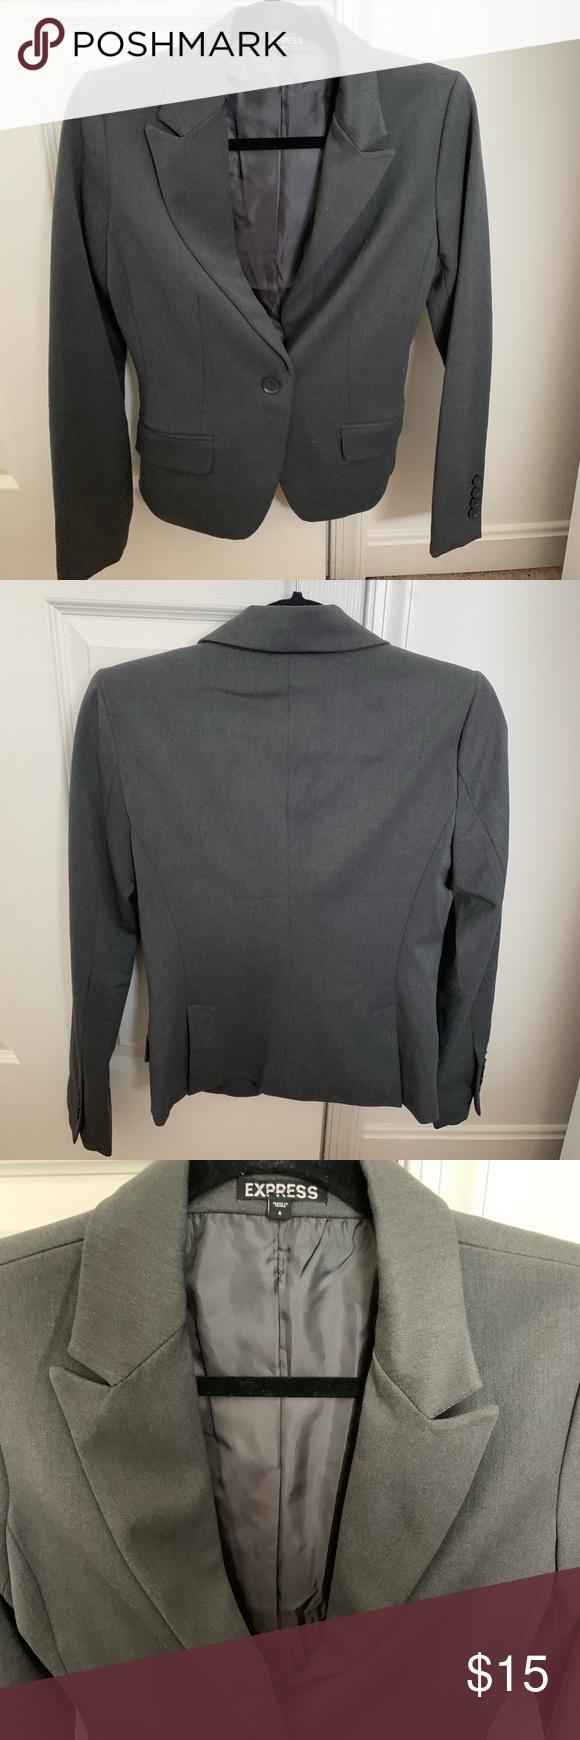 Womens Gray Blazer Like new womens blazer from express Worn once or twice Express Jackets  Coats Blazers Source by fayekopanitsano Blazers